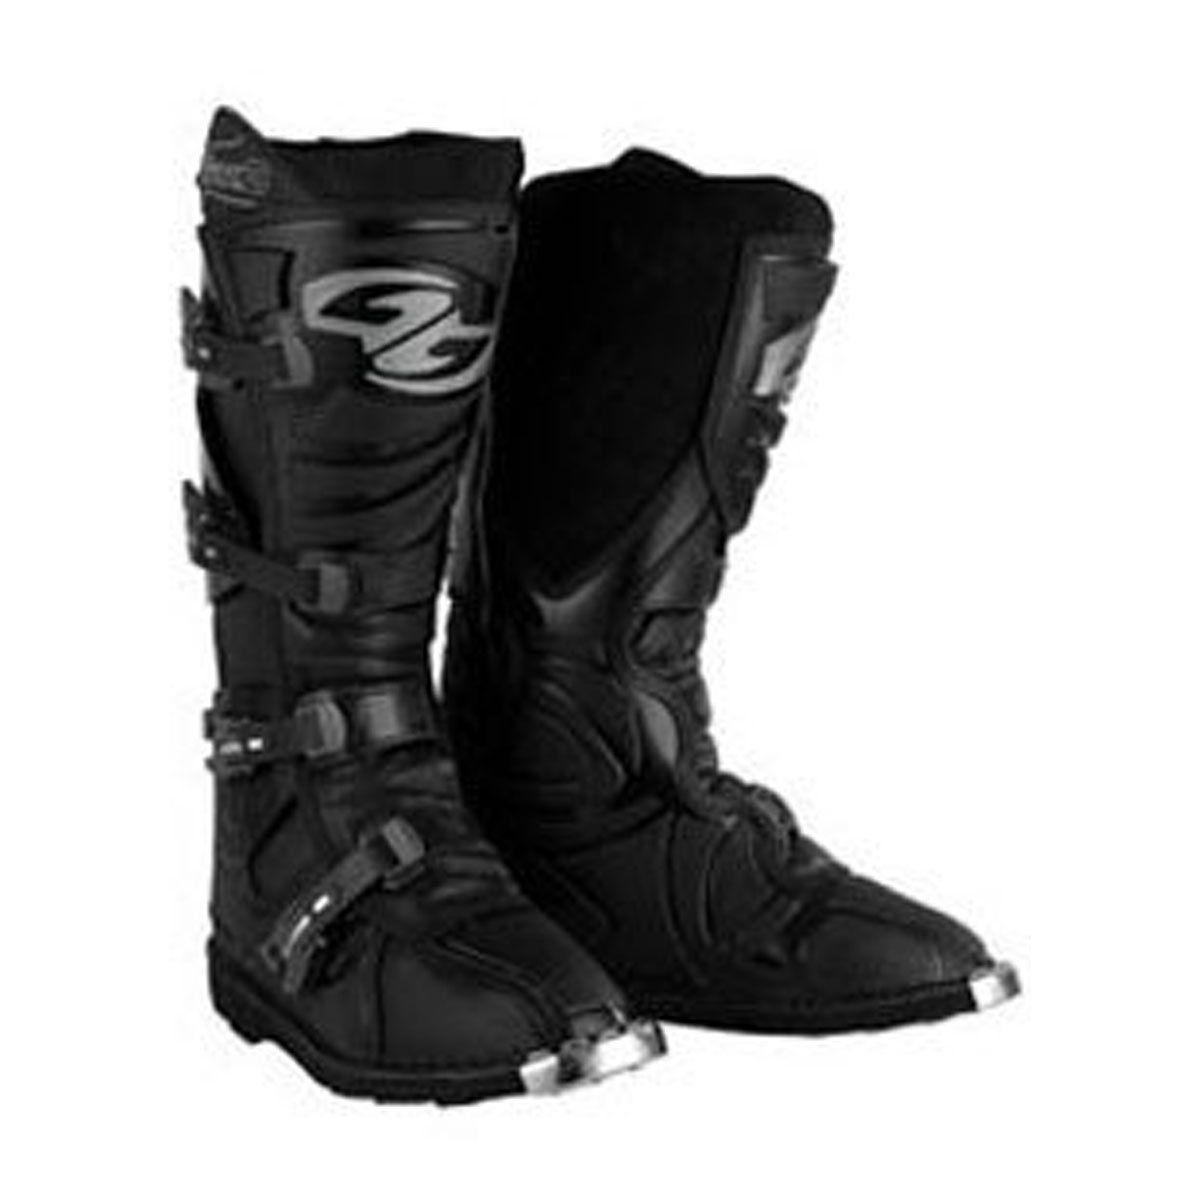 Bota para Motocross Protork Combat 3 Preta